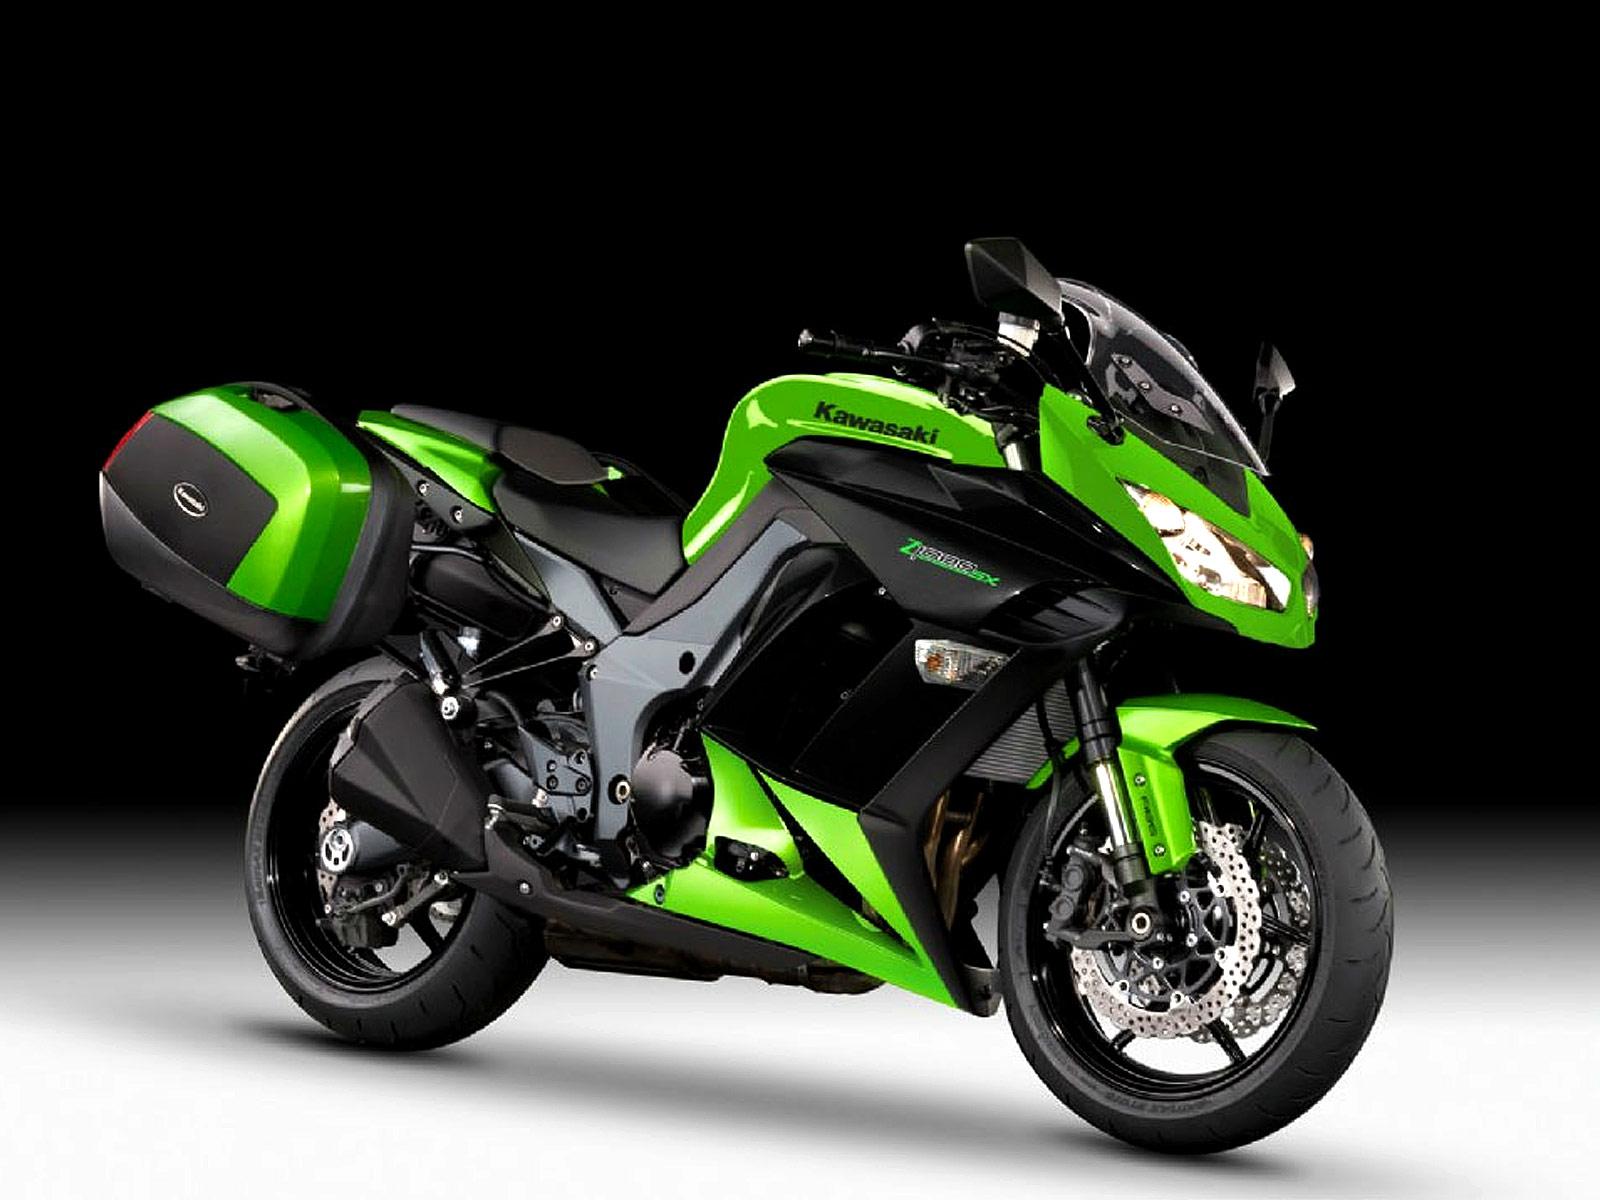 http://3.bp.blogspot.com/-rbHJqb7WkDU/TtgvpEsiKqI/AAAAAAAAFAo/rOCIjfqmJoA/s1600/2012-Kawasaki-Z1000SX-Tourer-motorcycle-desktop-wallpaper_3.jpg